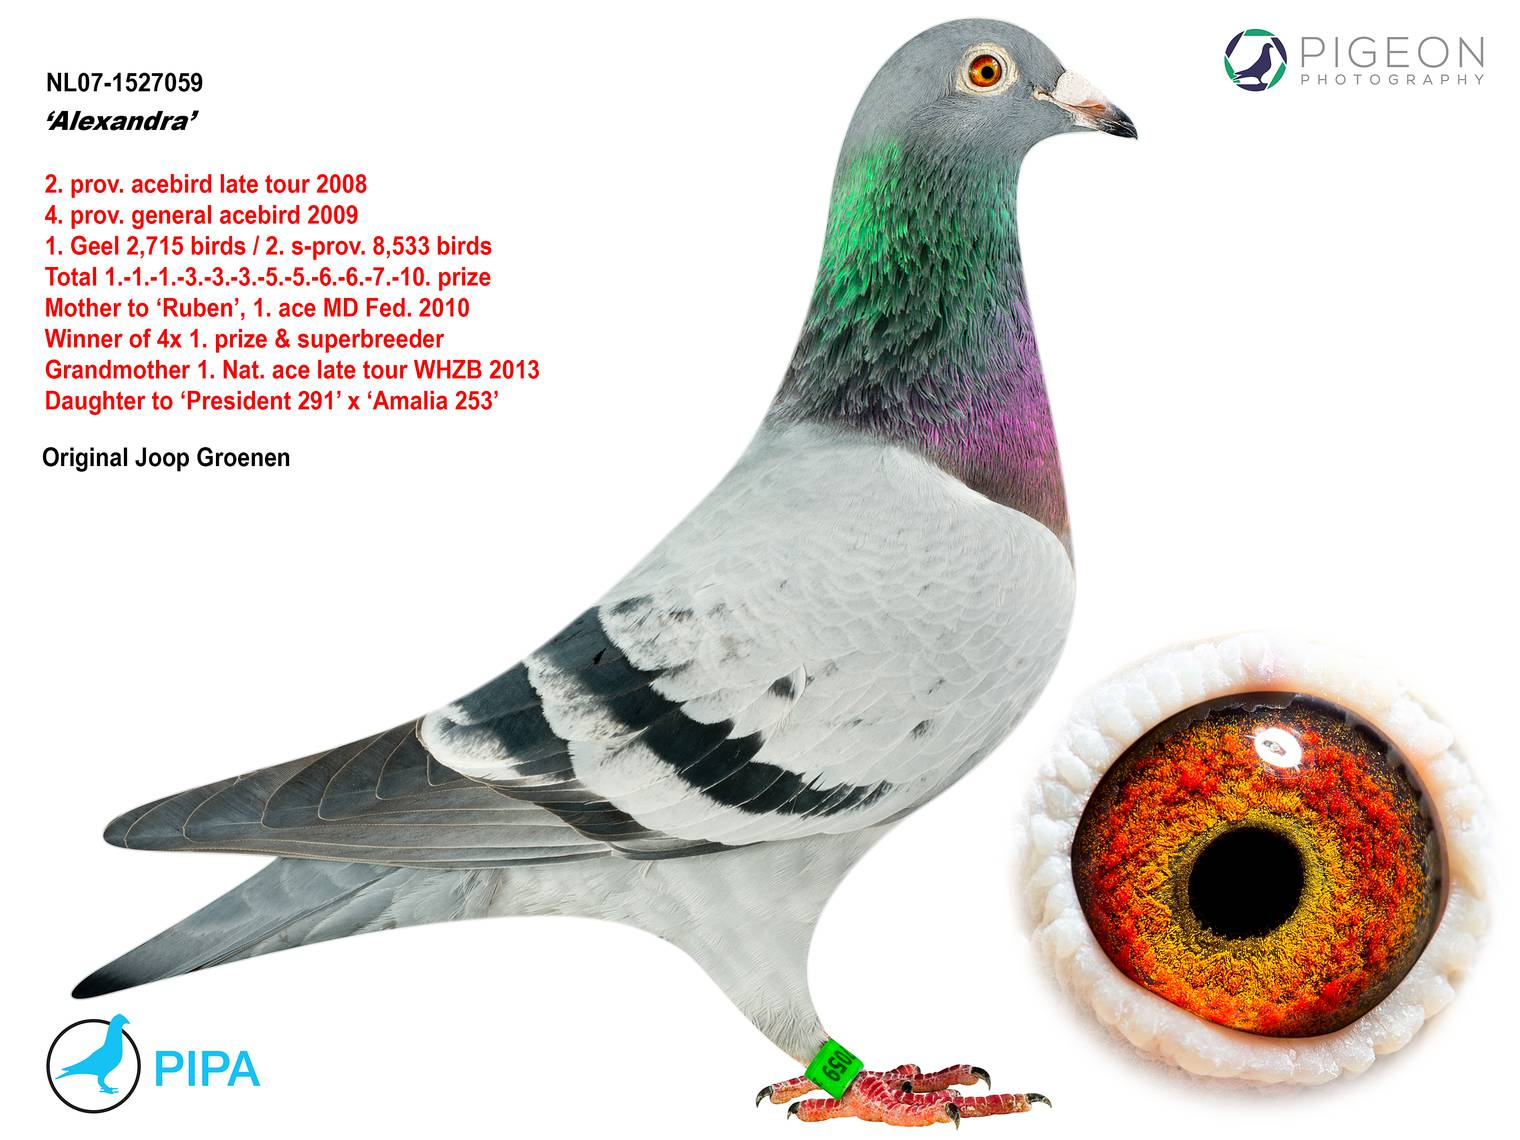 NL07-1527059